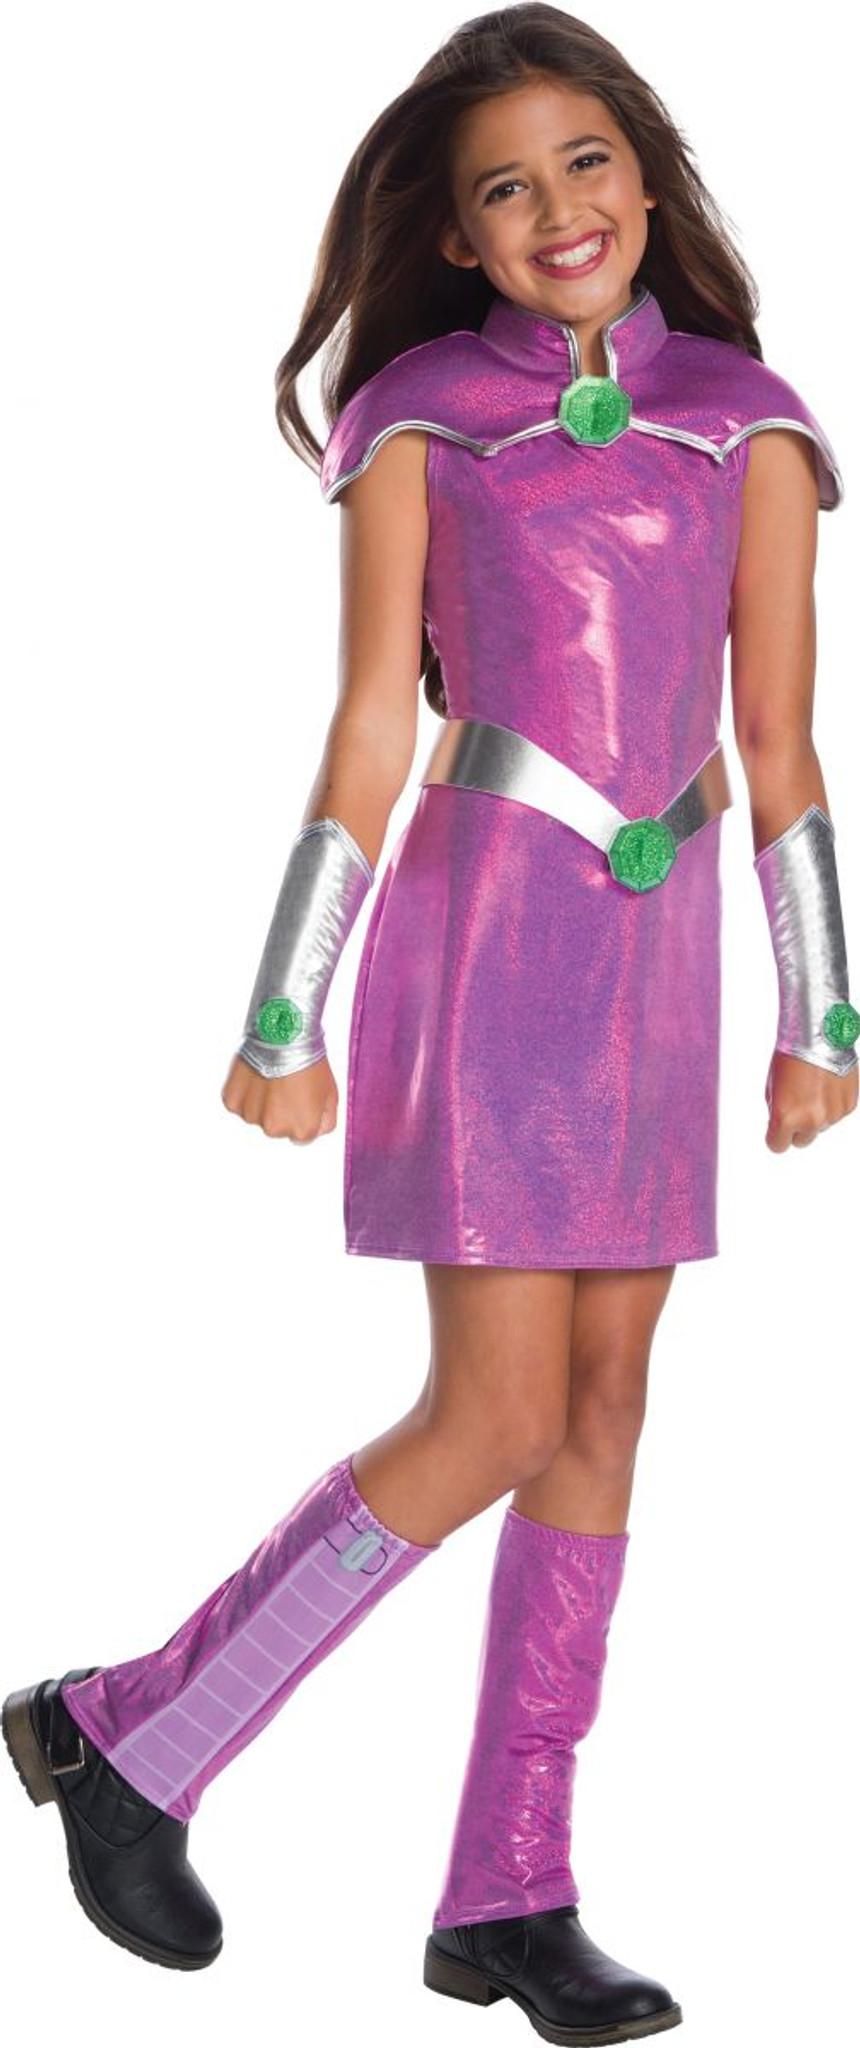 Brand New DC Super Hero Girls Deluxe Catwoman Child Costume